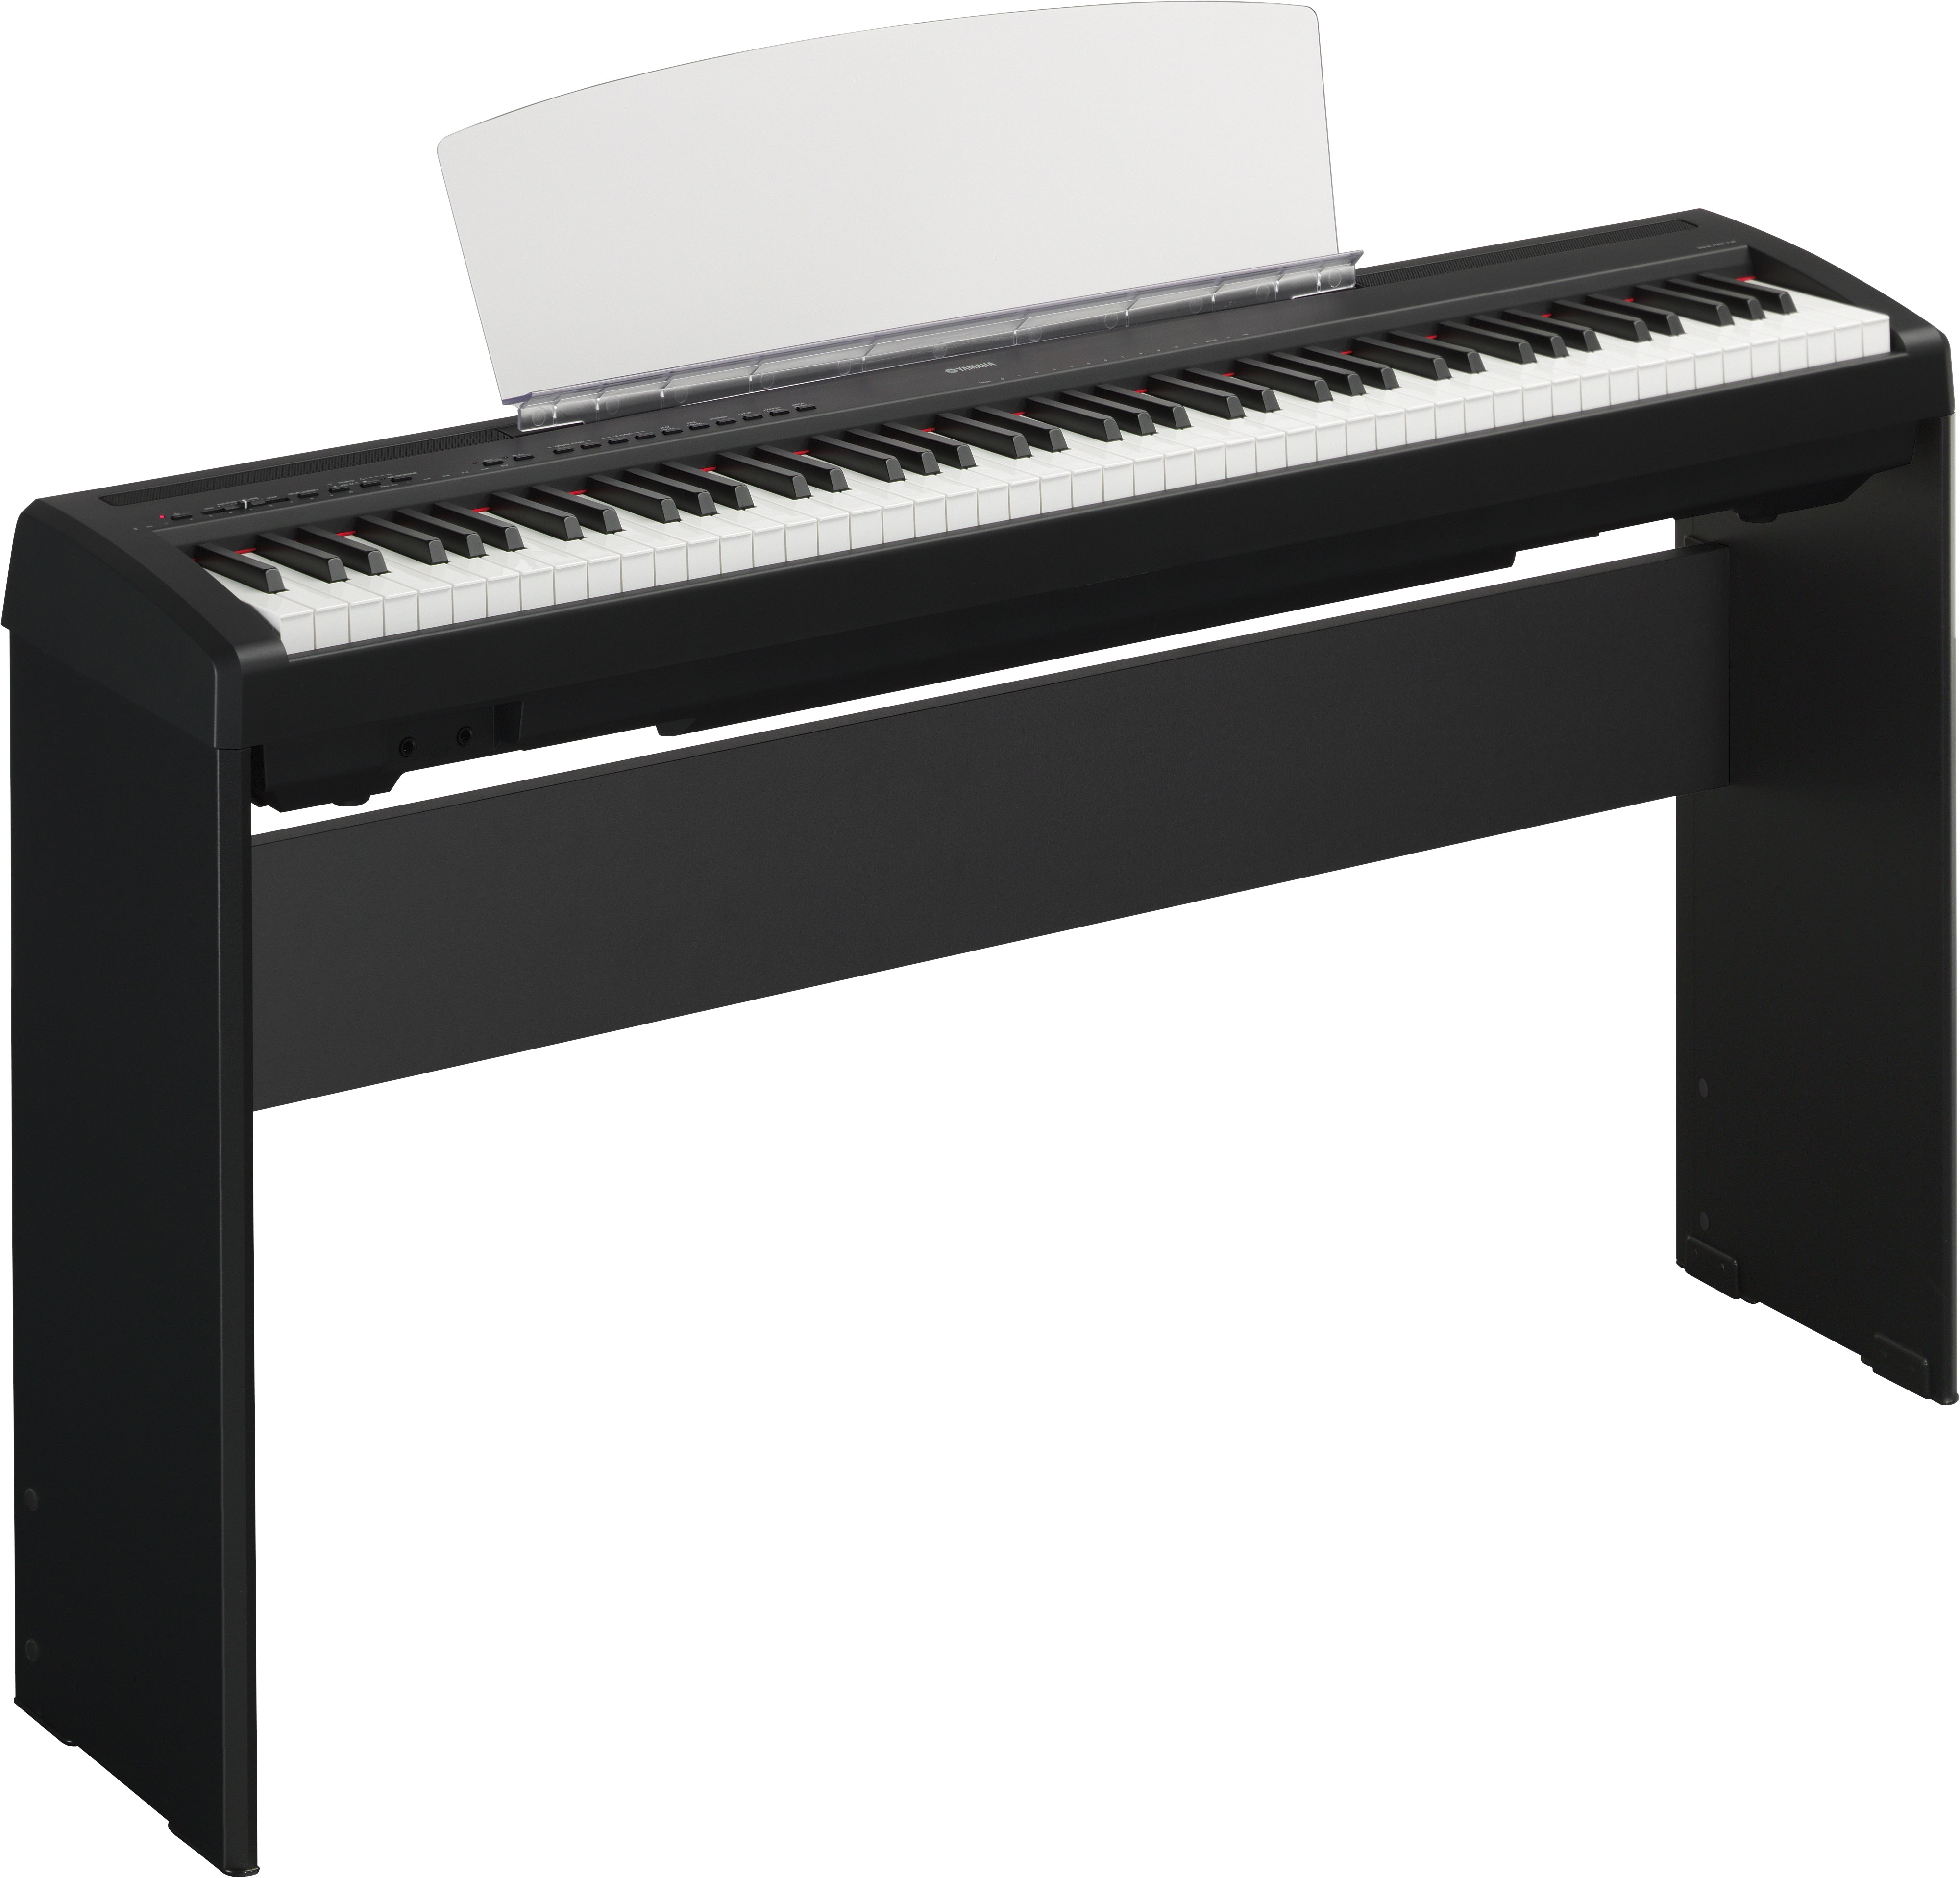 yamaha p 95b digital piano 12 watt schwarz musikinstrumente. Black Bedroom Furniture Sets. Home Design Ideas